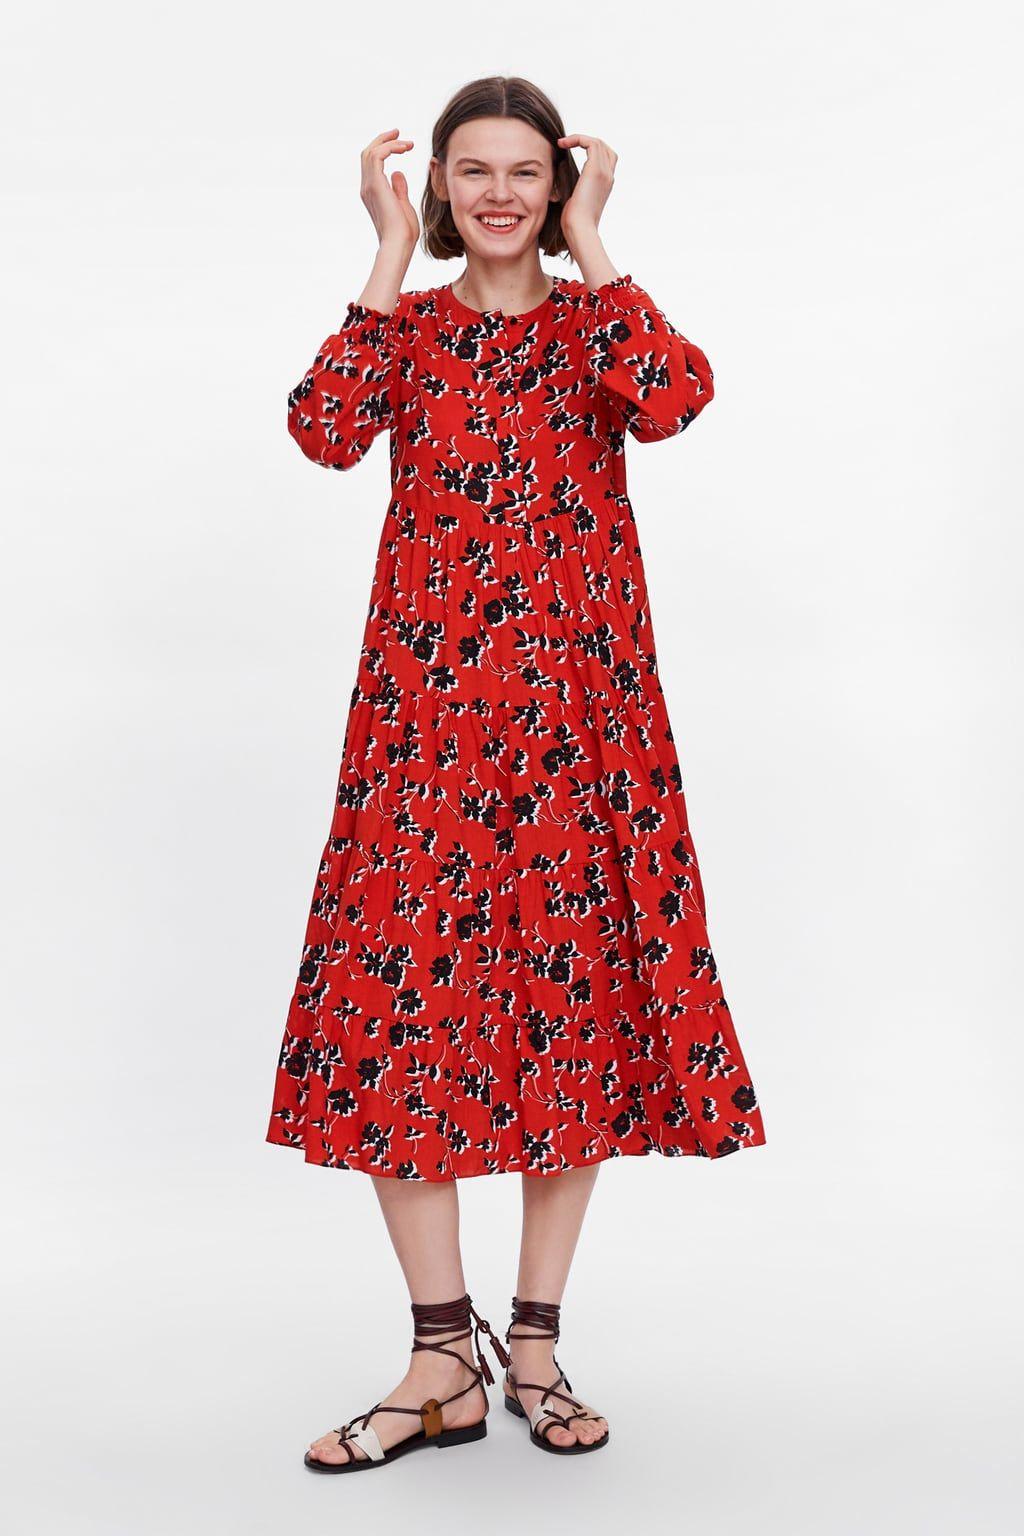 vestido estampado floral | outfit, blumendruck kleider